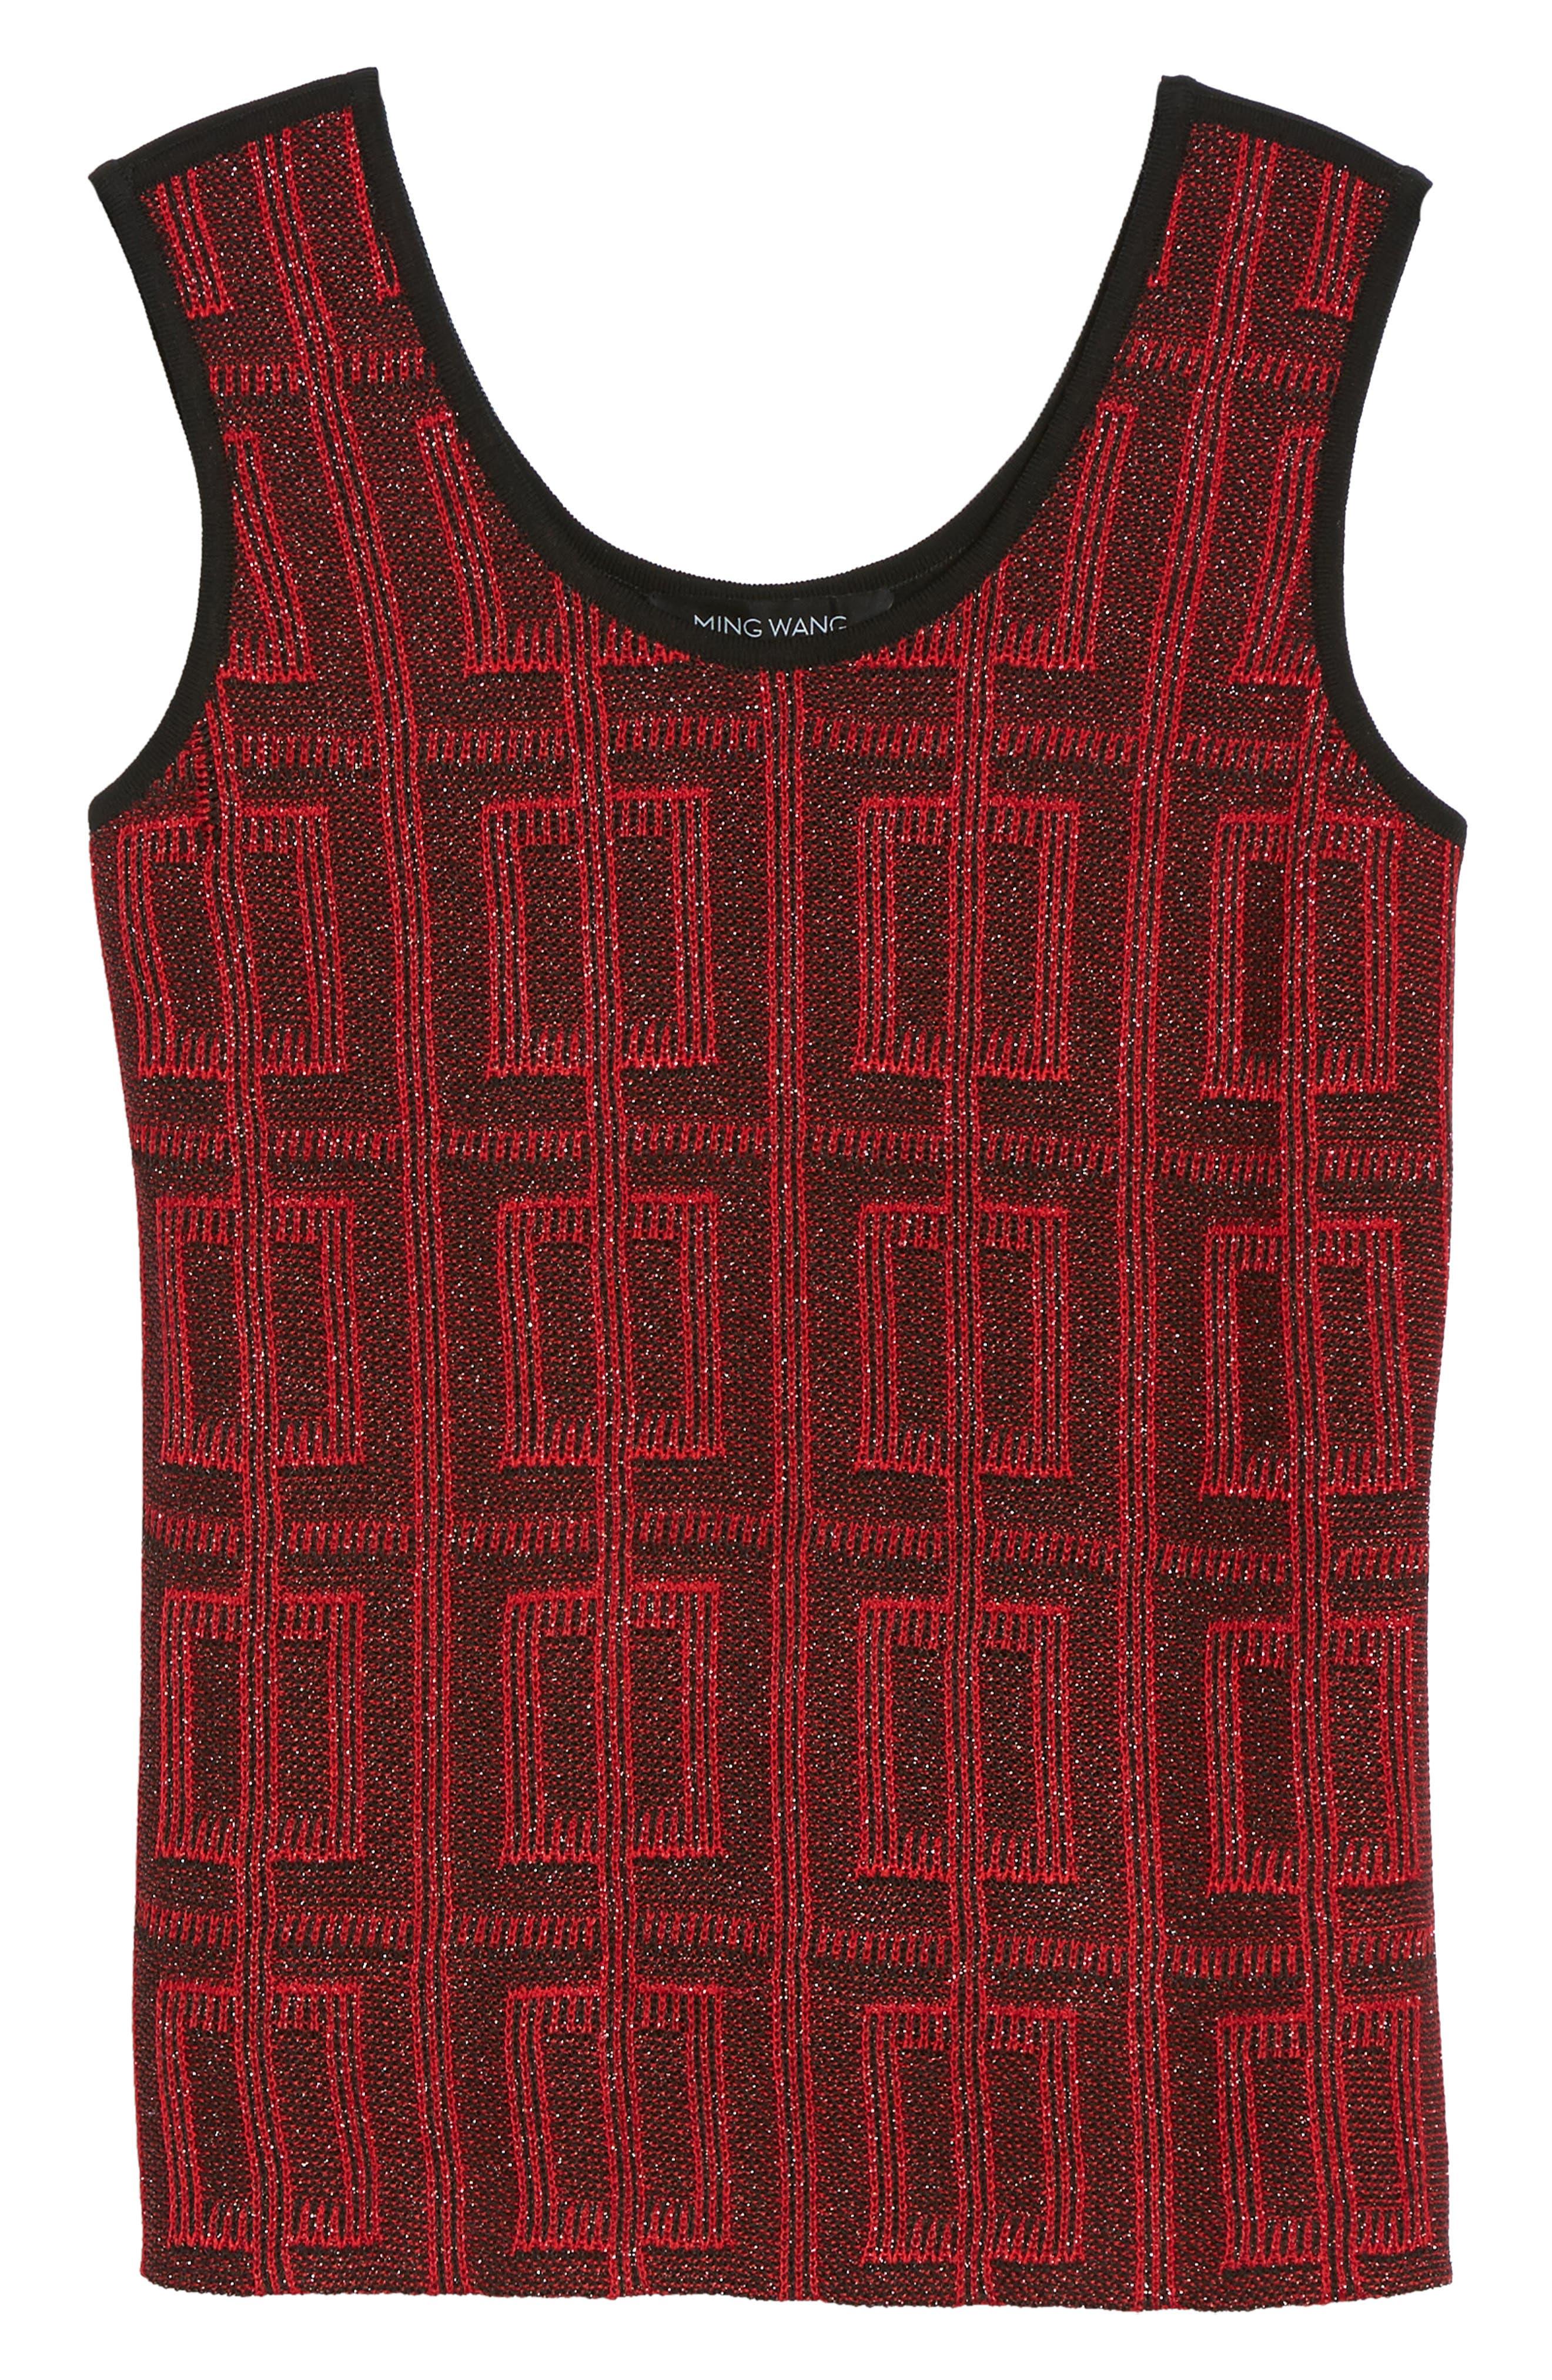 Scoop Neck Tweed Knit,                             Alternate thumbnail 6, color,                             Dusk Red/ Black